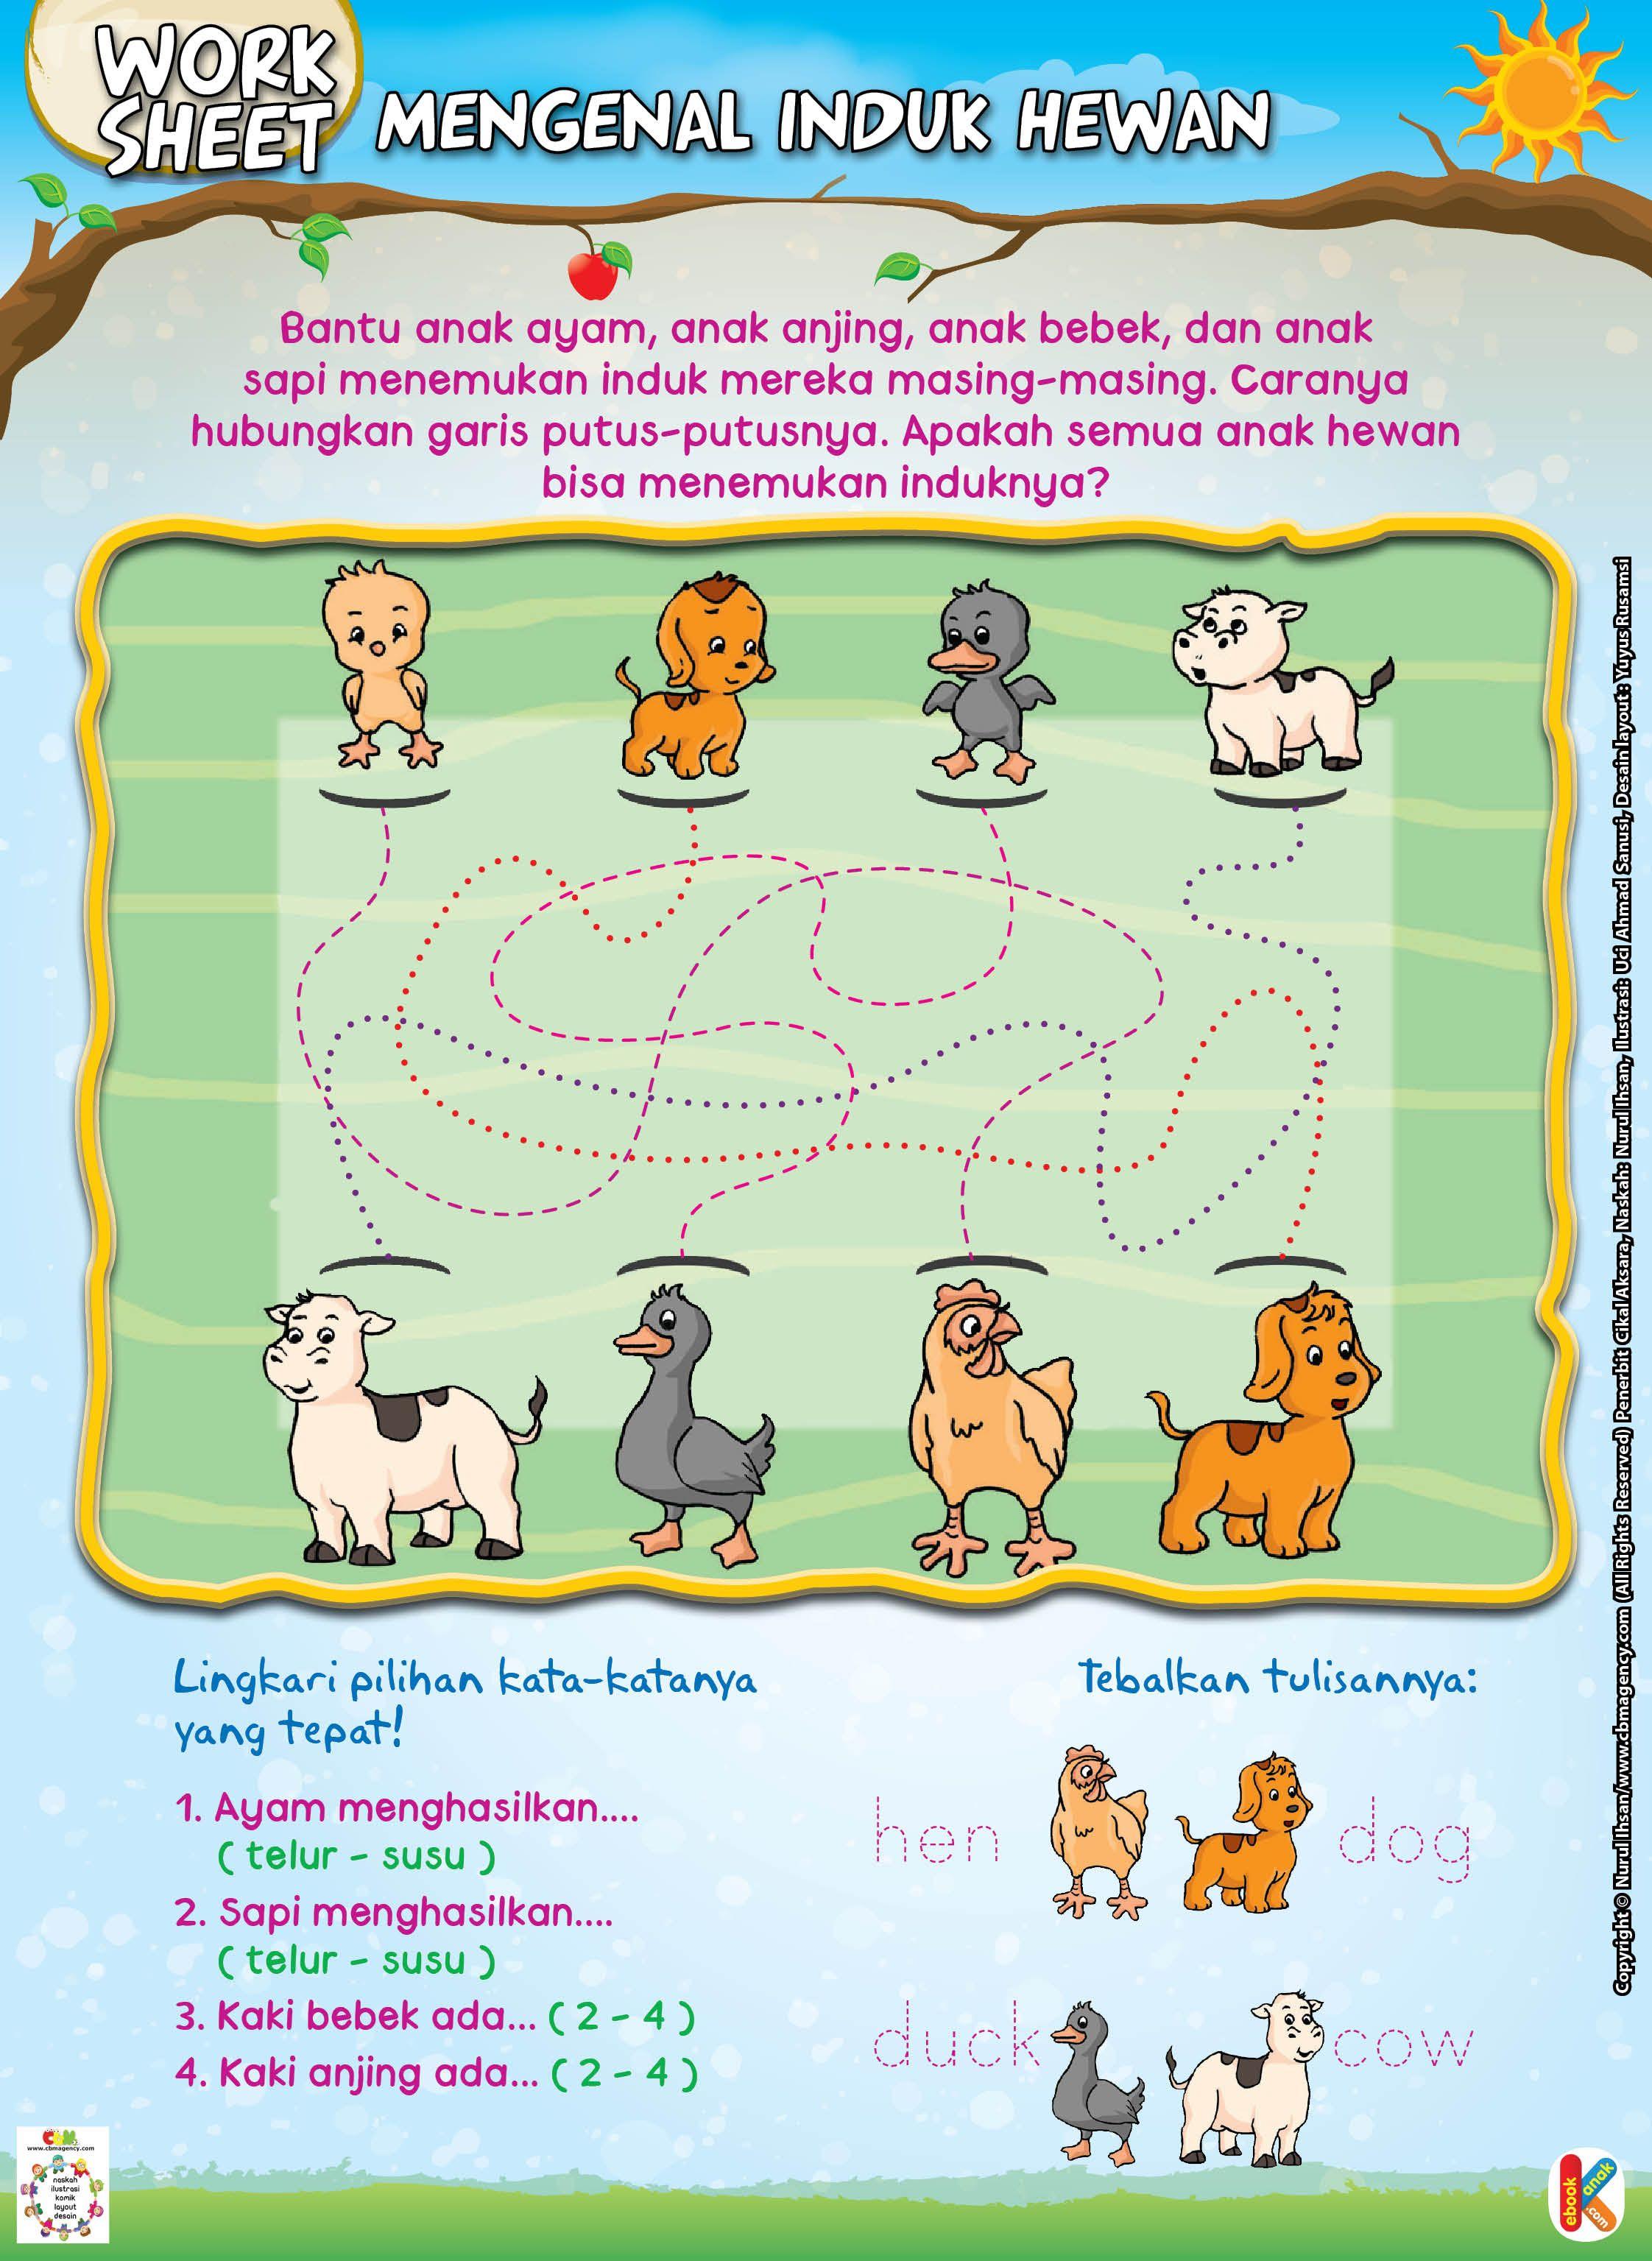 Mengenal Induk Hewan